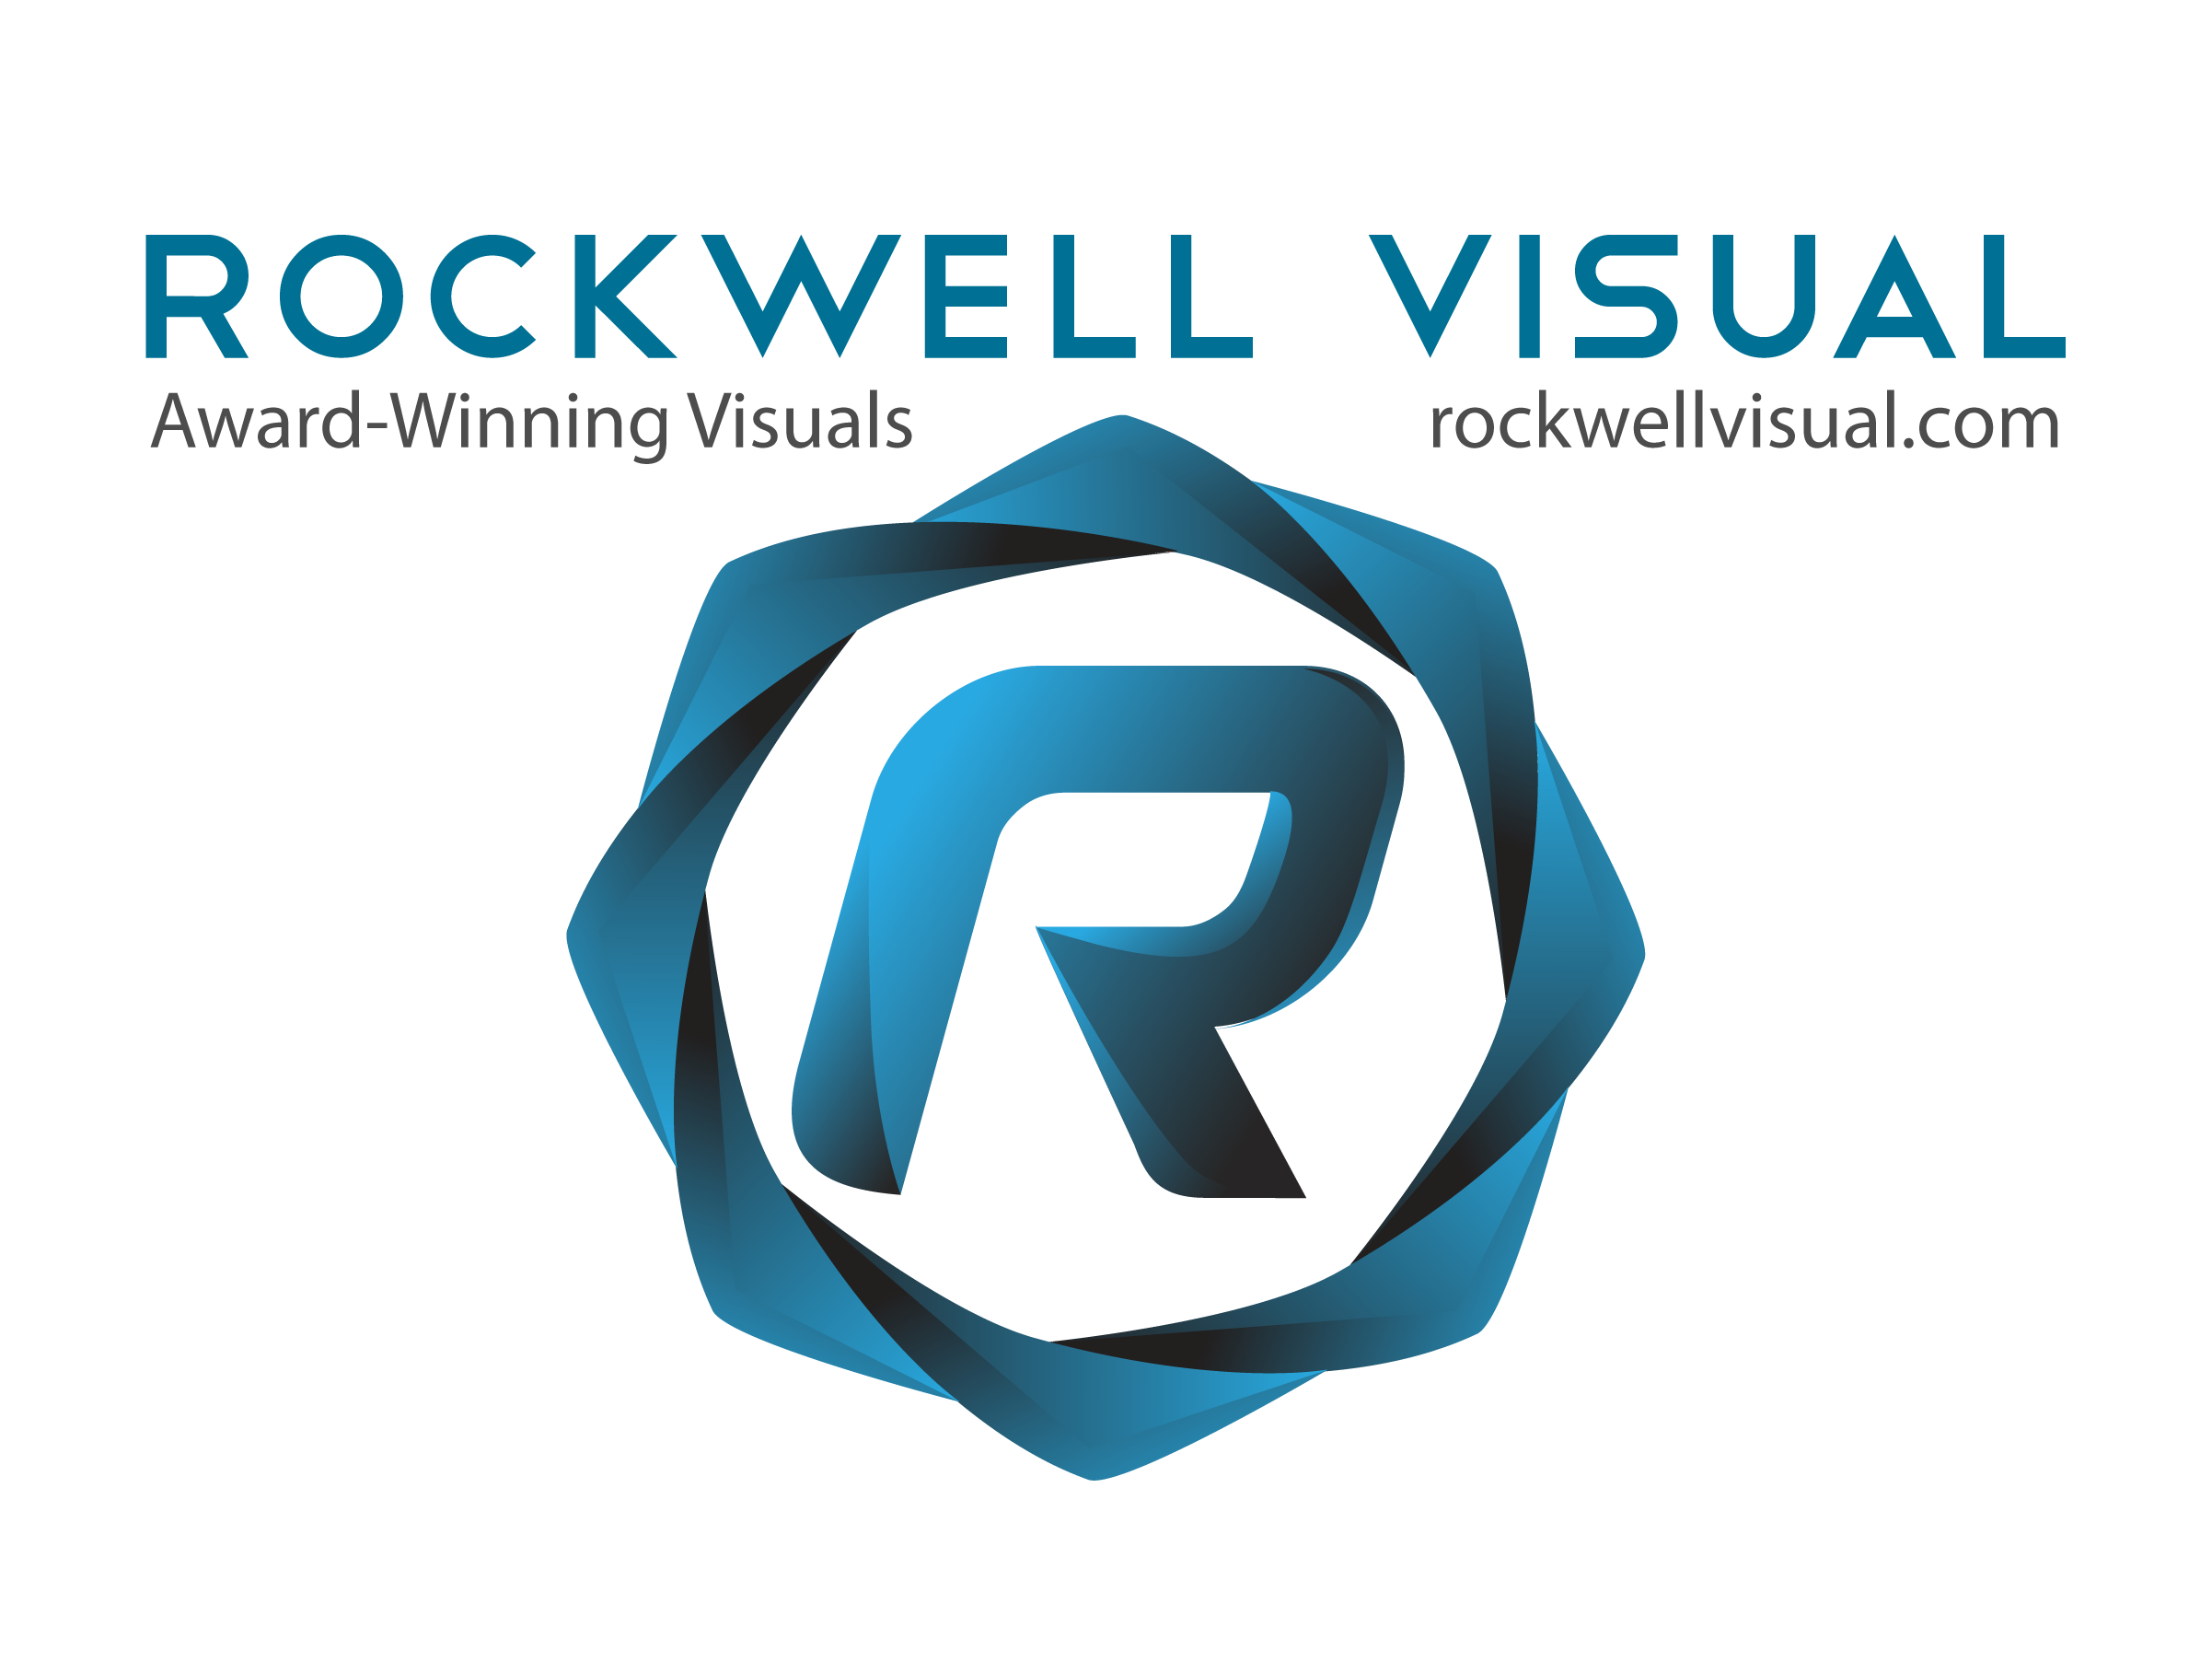 Rockwell Visual Production Company